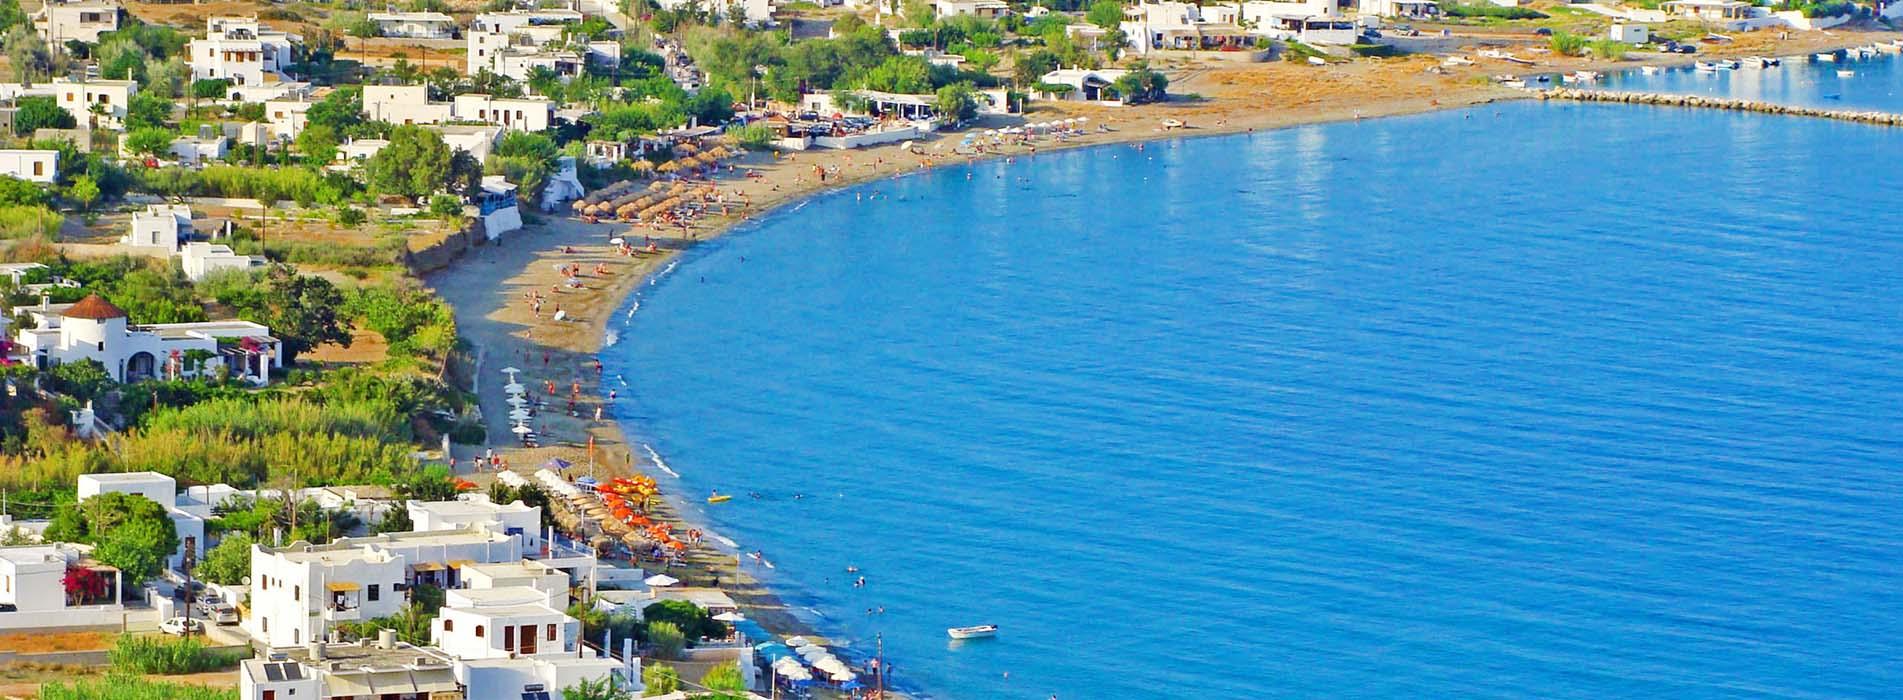 Greece - Skyros 1 (main)